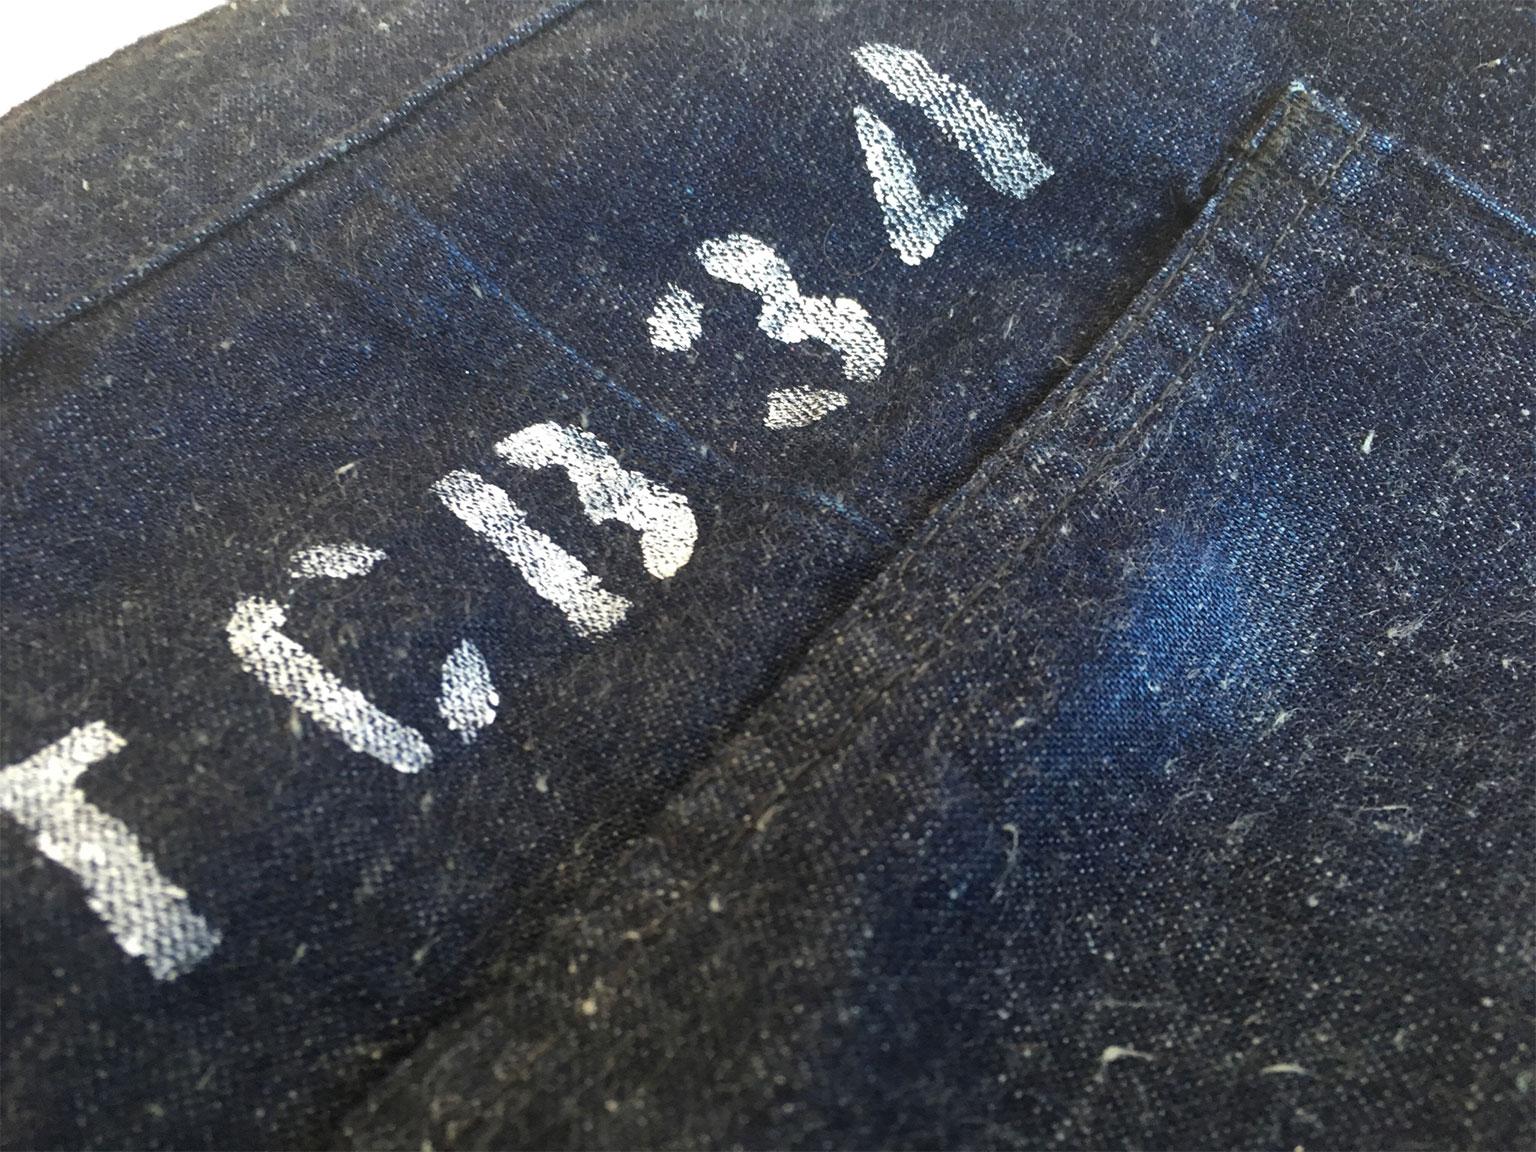 TCB Seaman trousers paint